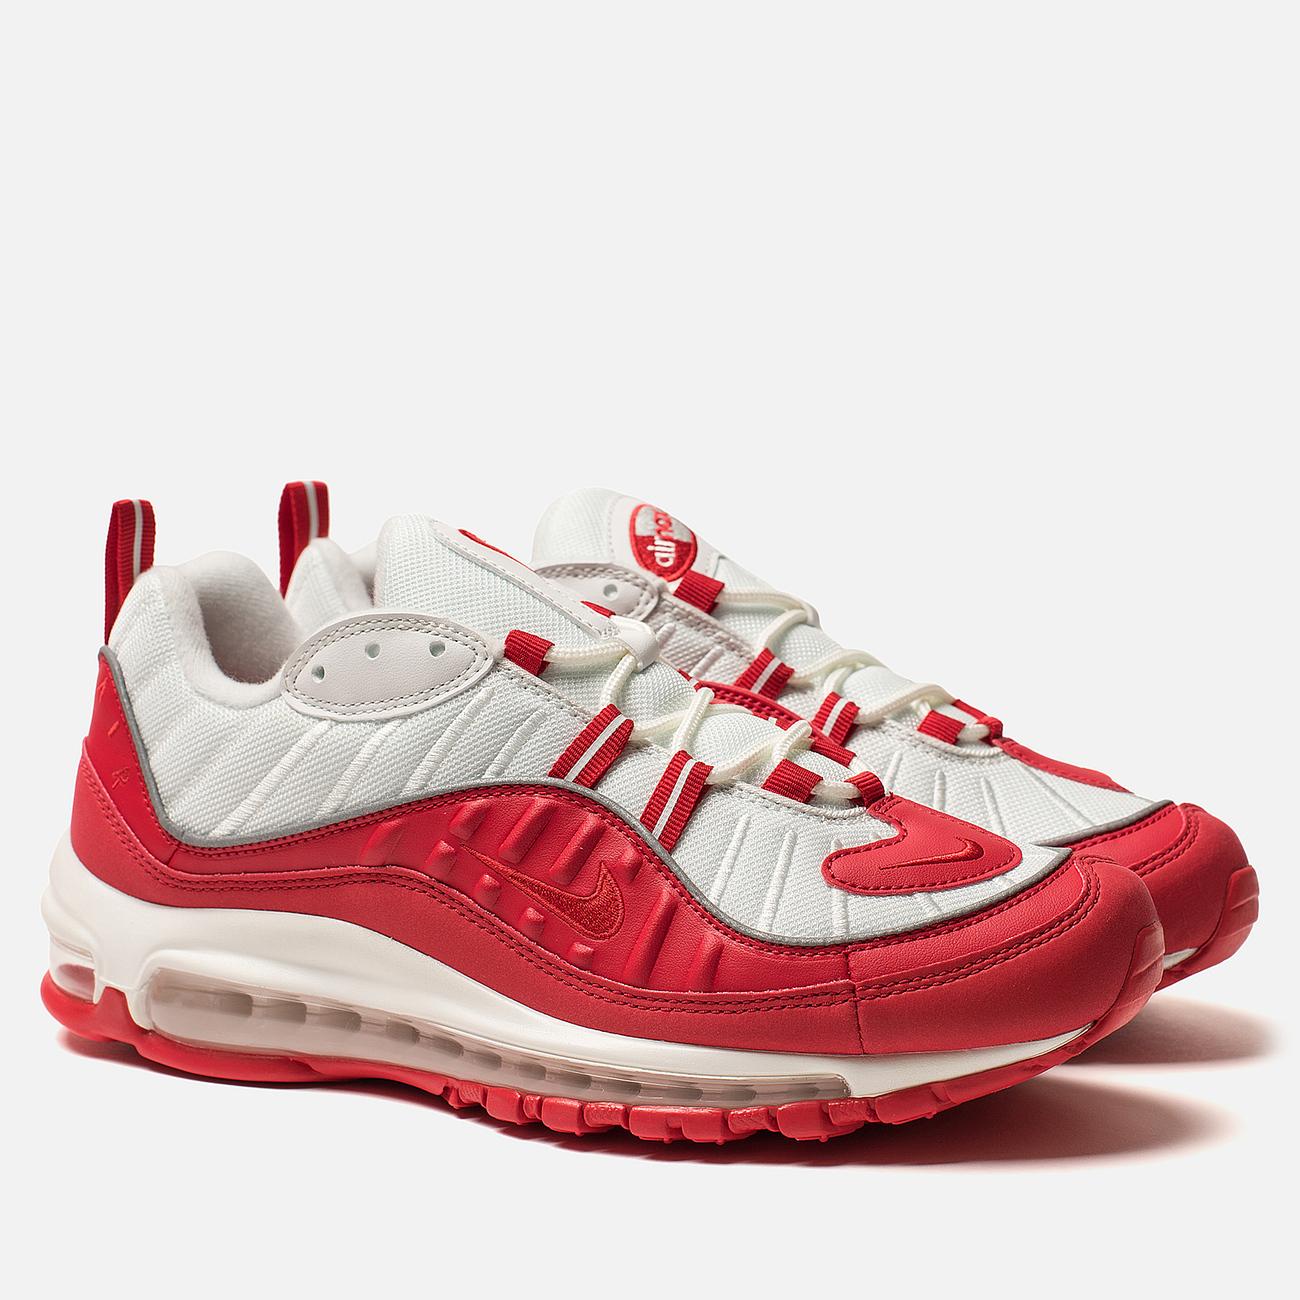 Кроссовки Nike Air Max 98 University Red/University Red